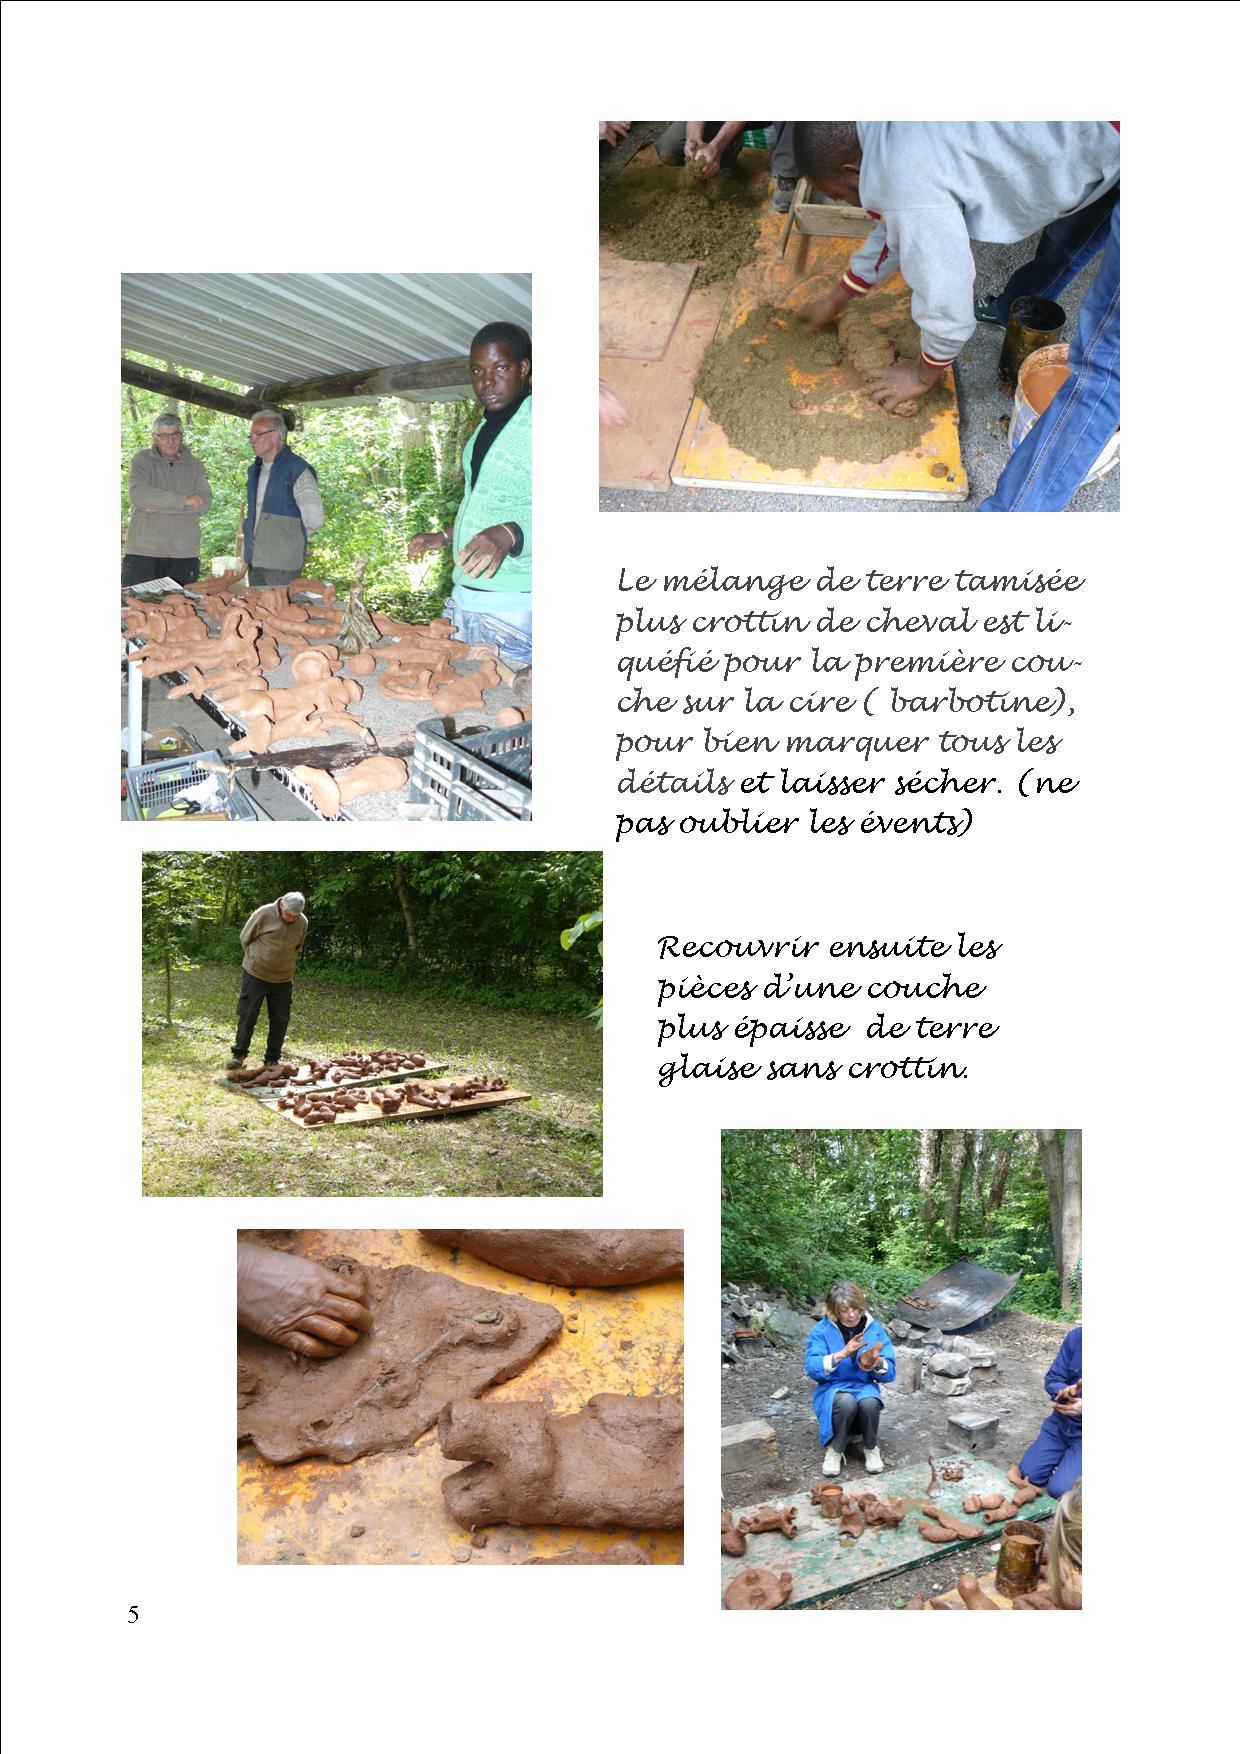 5 stage avec les artisans bronziers du Burkina Faso mai 2015 .jpg